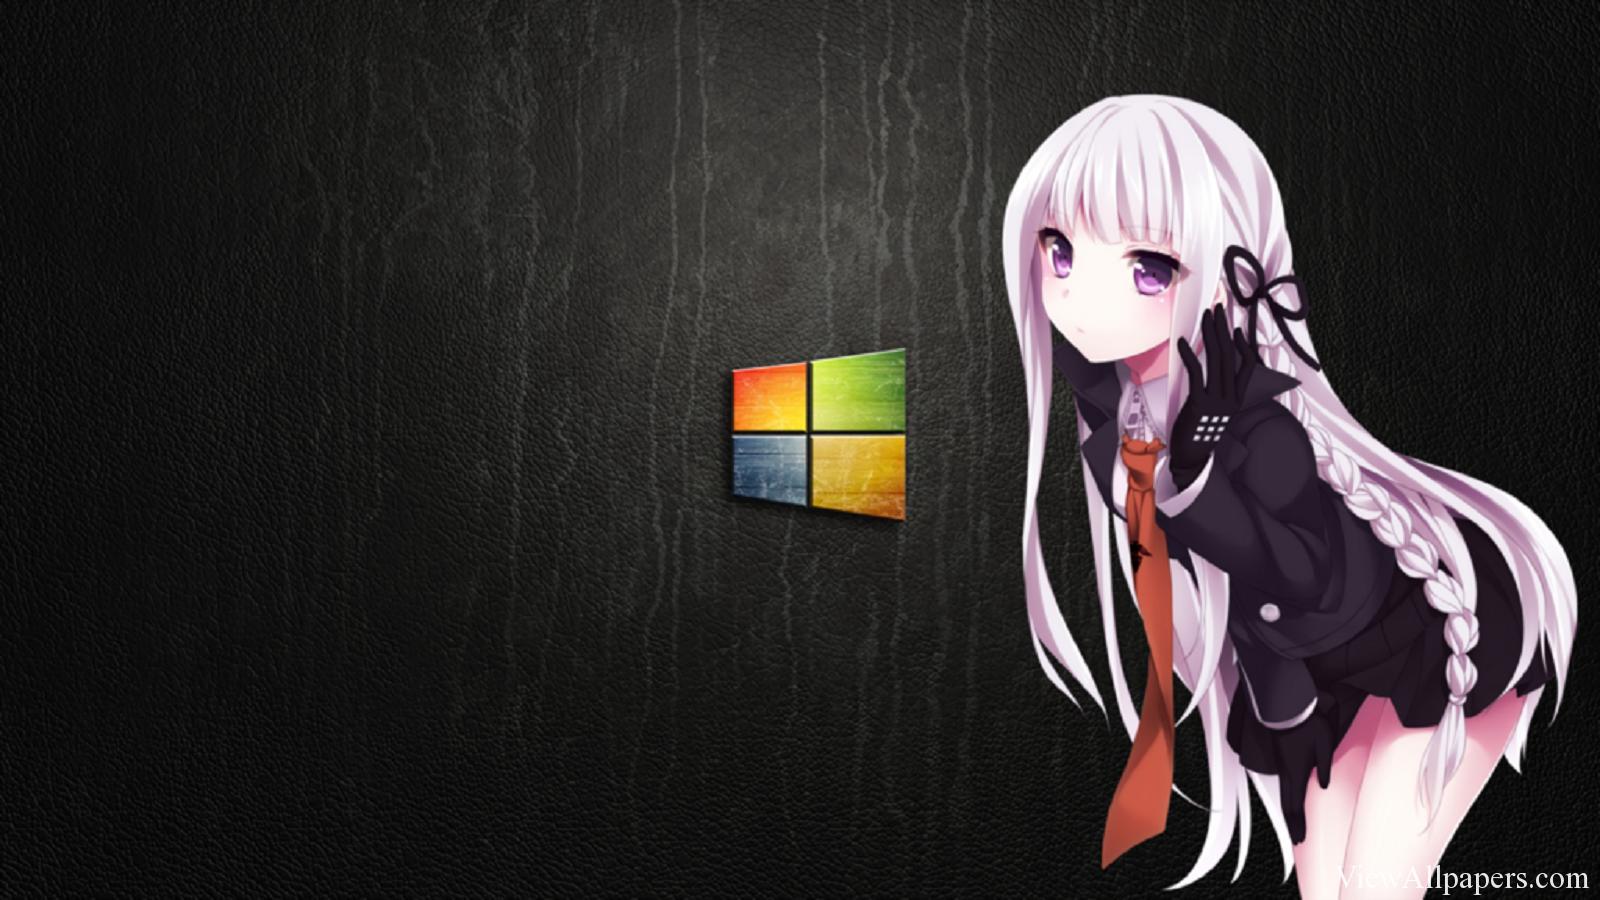 Windows Anime Anime HD Wallpapers 1600x900